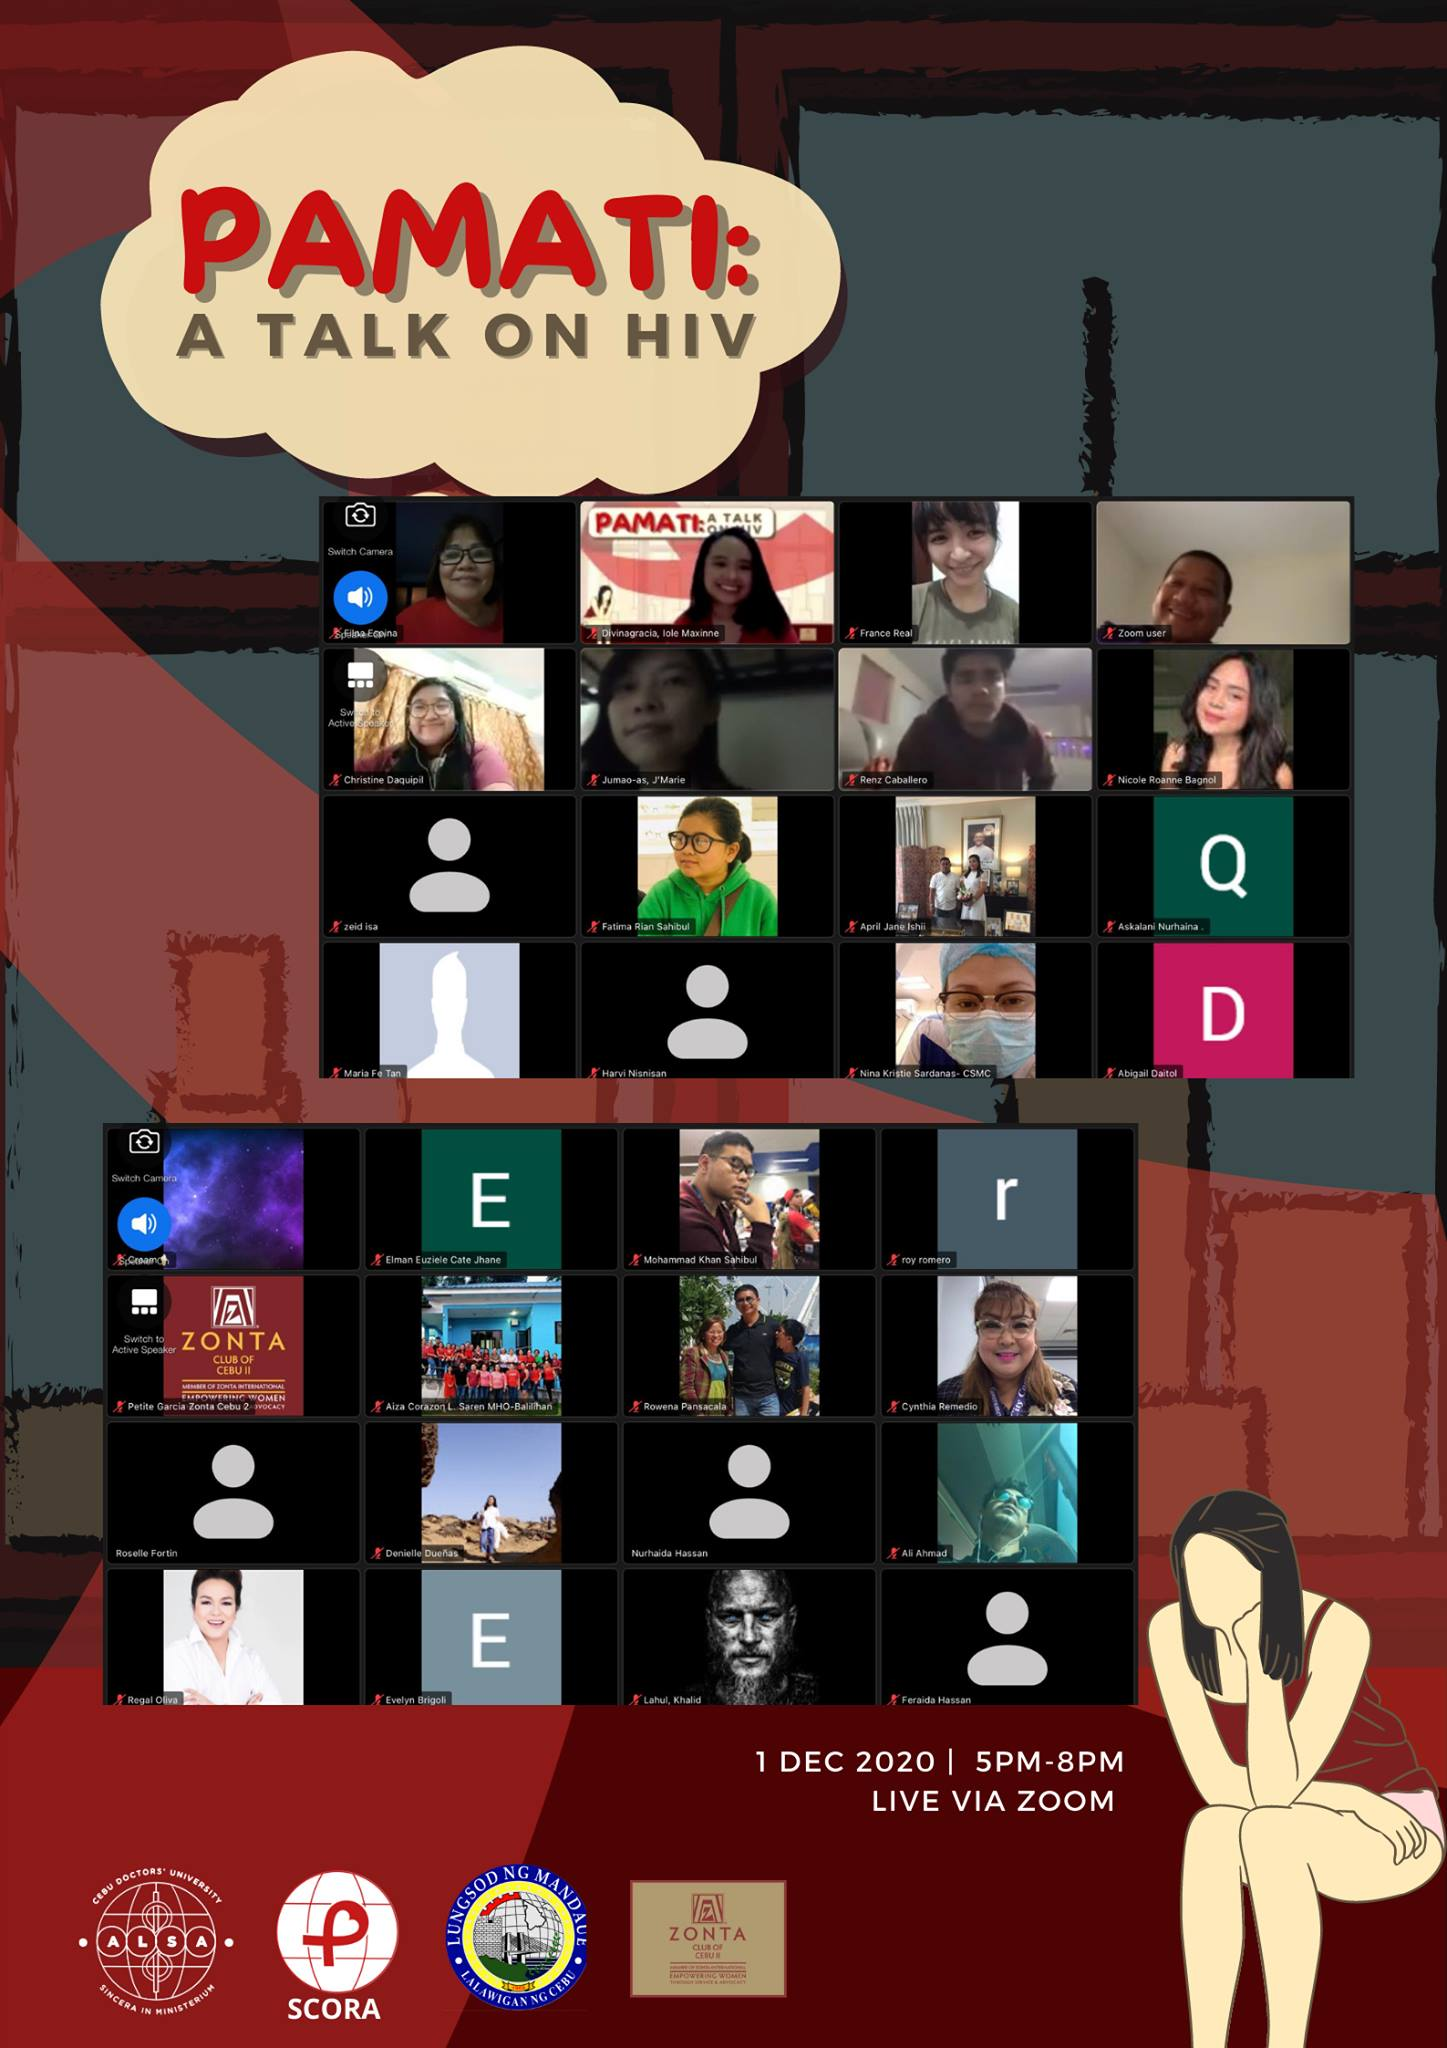 D:\2020 DESKTOP FILES\RMA NEWS\ARTICLES\ARTICLE 652 - ZONTA HIV\PR 16 - HIV\2.jpg